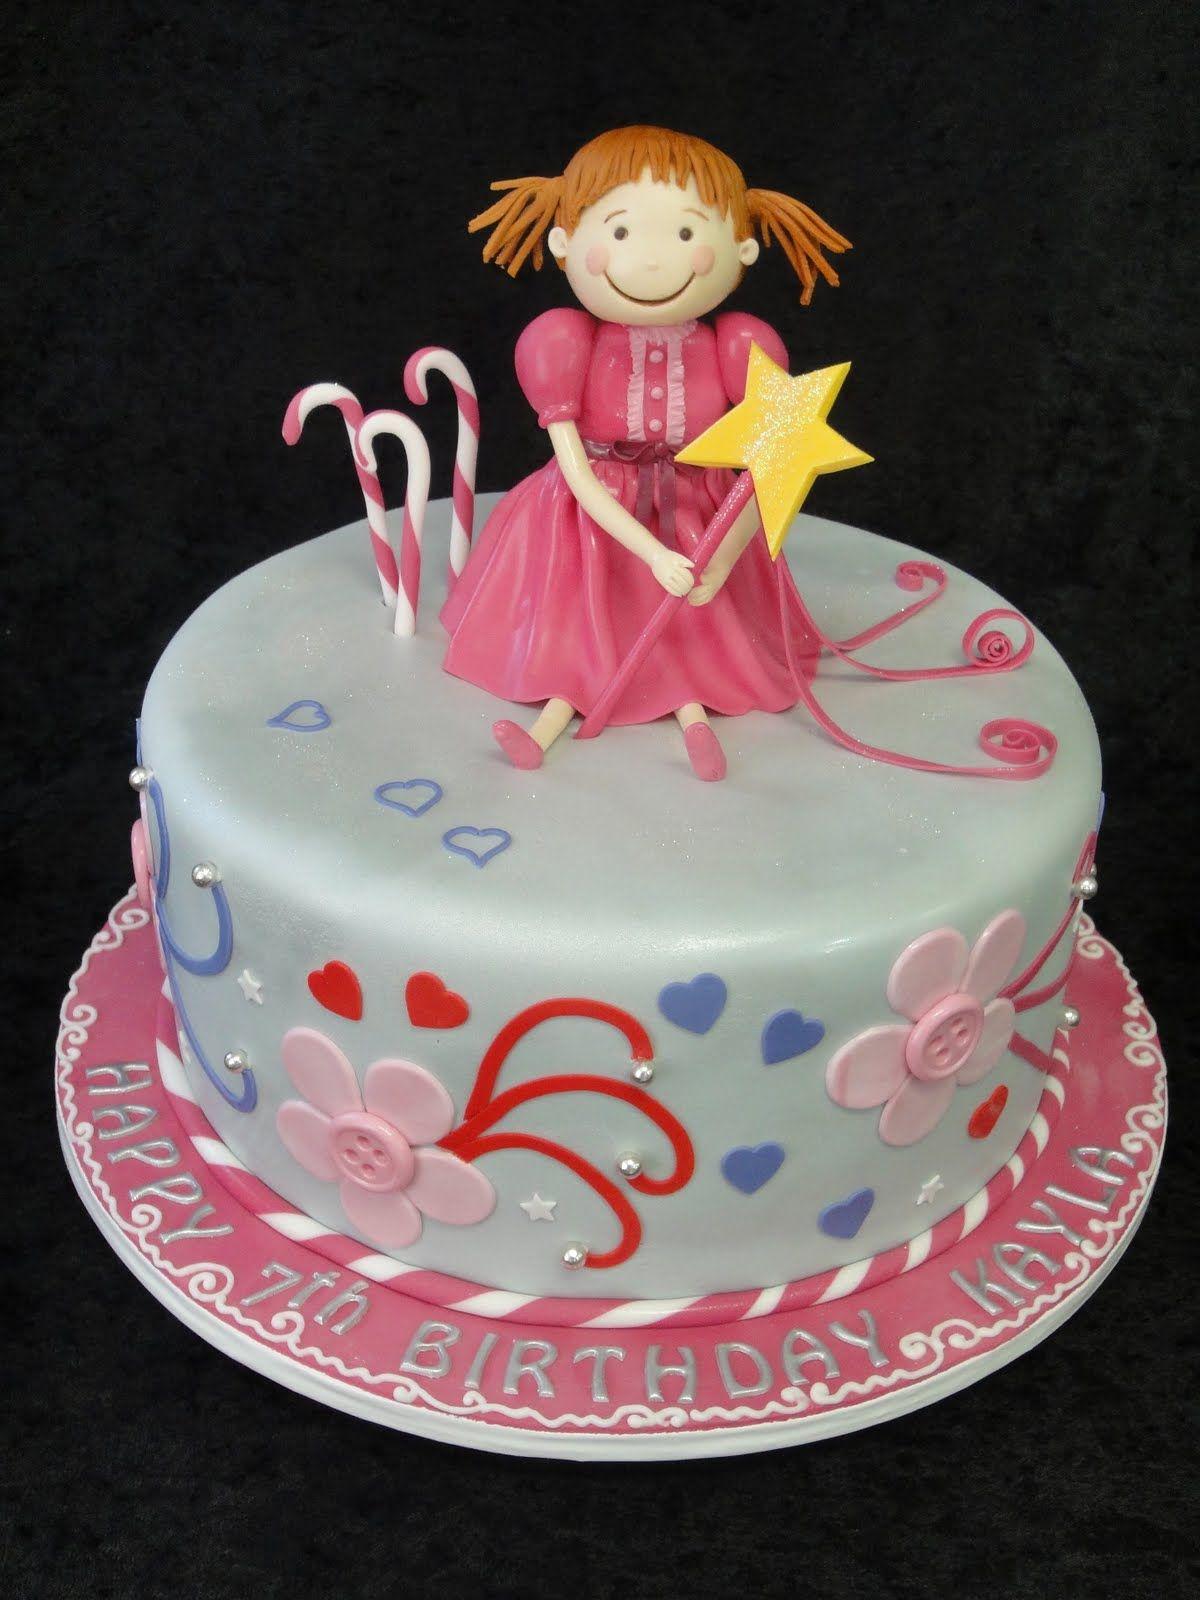 silverlicious by bakemeacakeorlando Girly birthday cakes